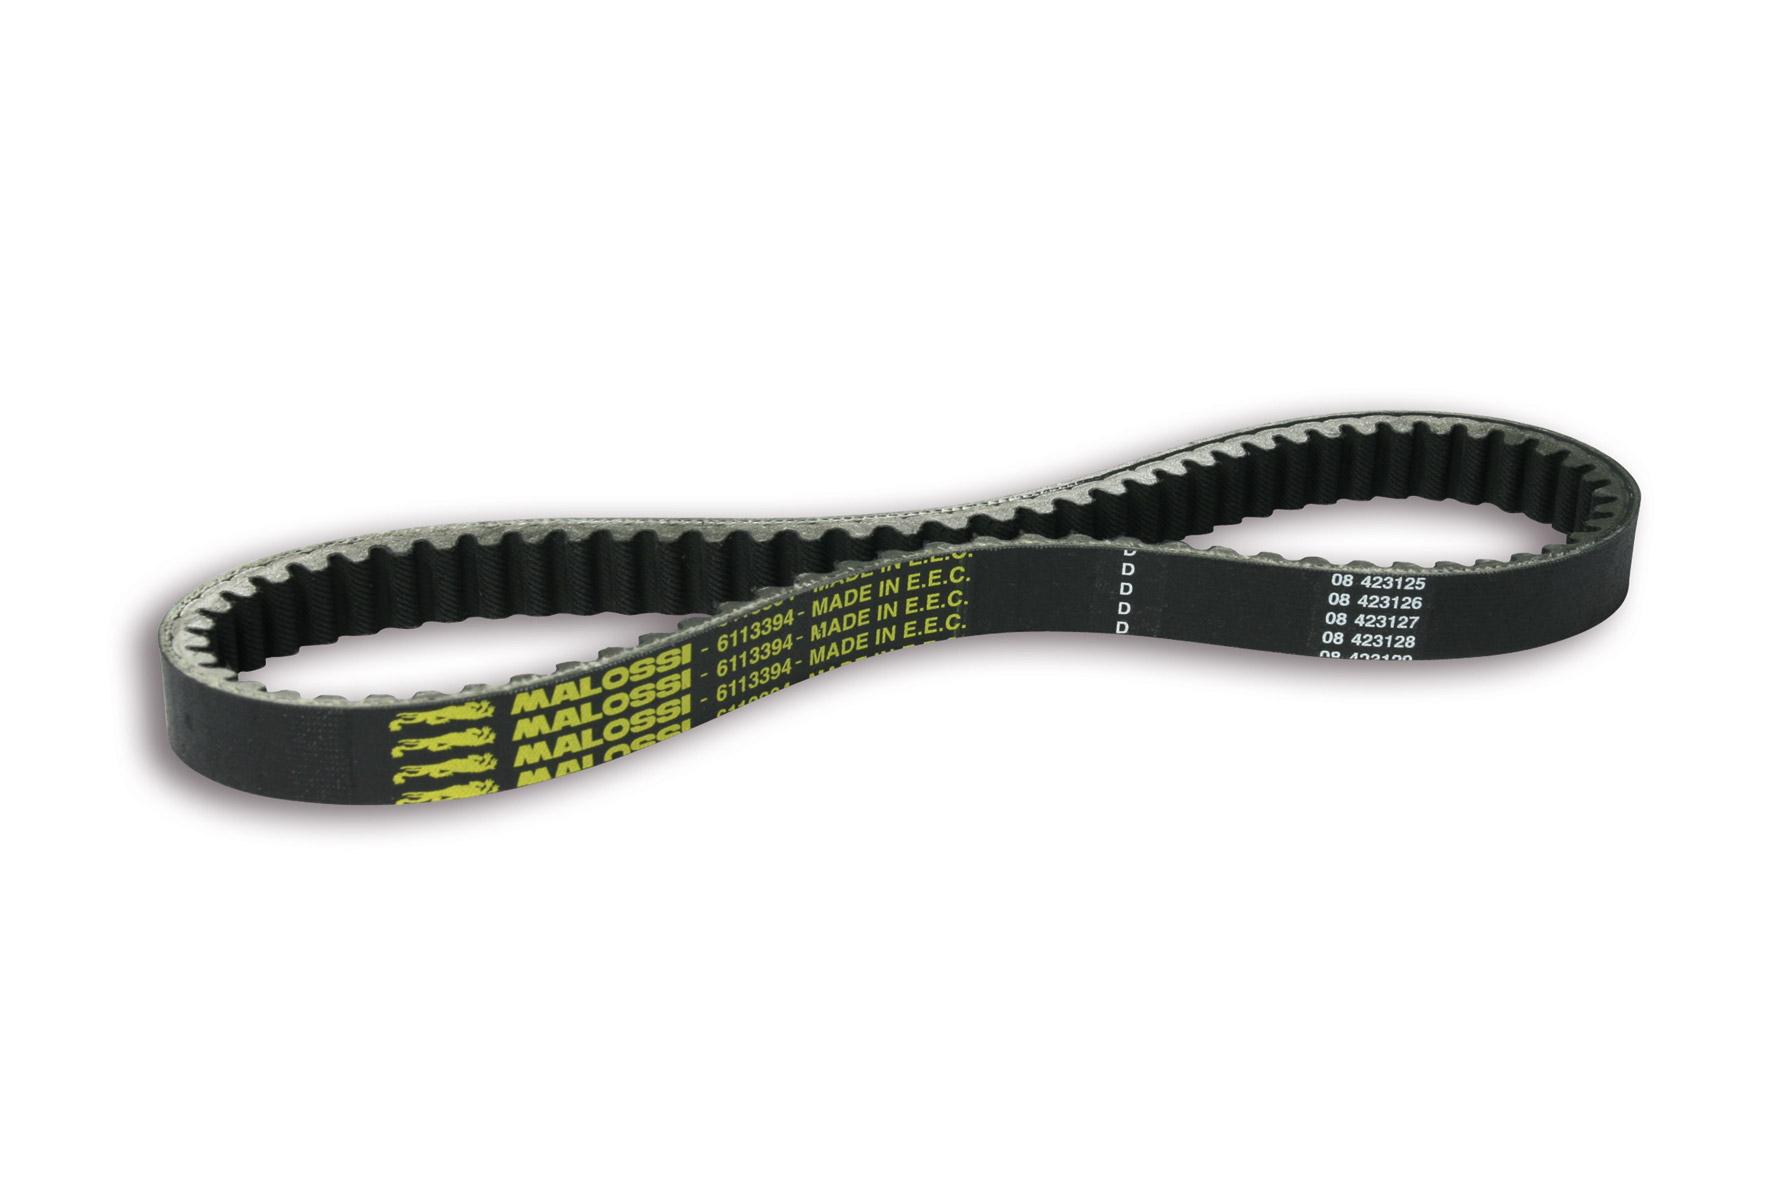 Cinghia X K belt per Yamaha Cignus X 4T 125 cc - Cignus X ie 4T euro 3 125 cc  (dimensione 22x9,3x796 mm - angolo 28°)